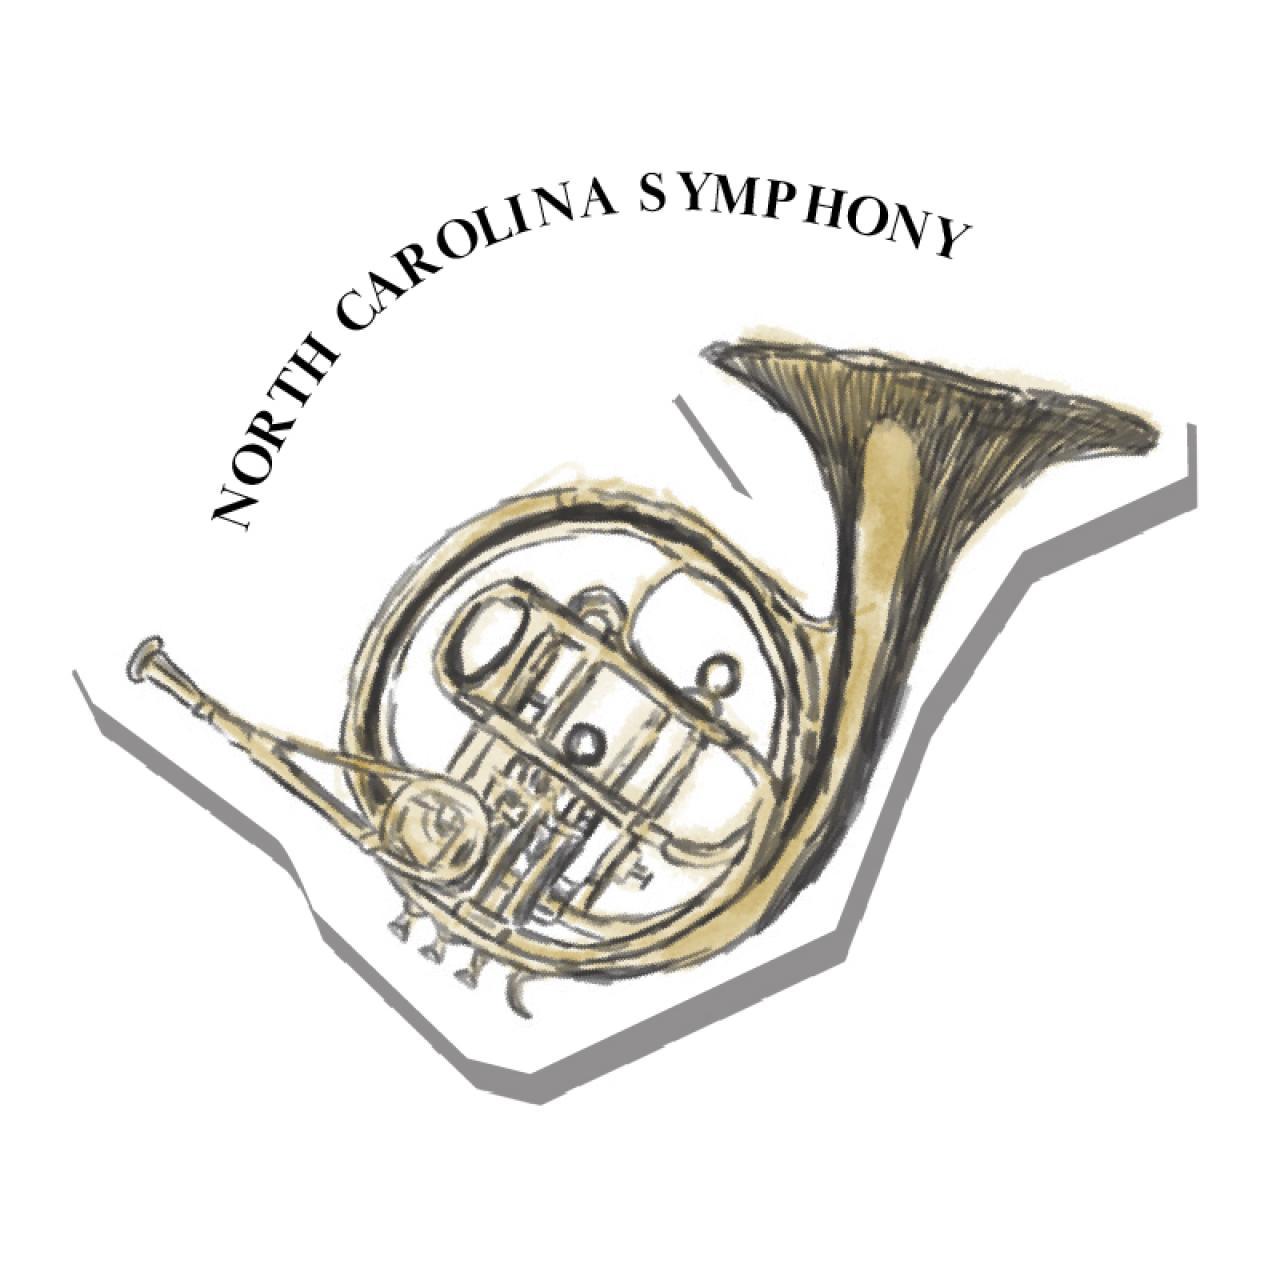 An illustration of a french horn, North Carolina Symphony